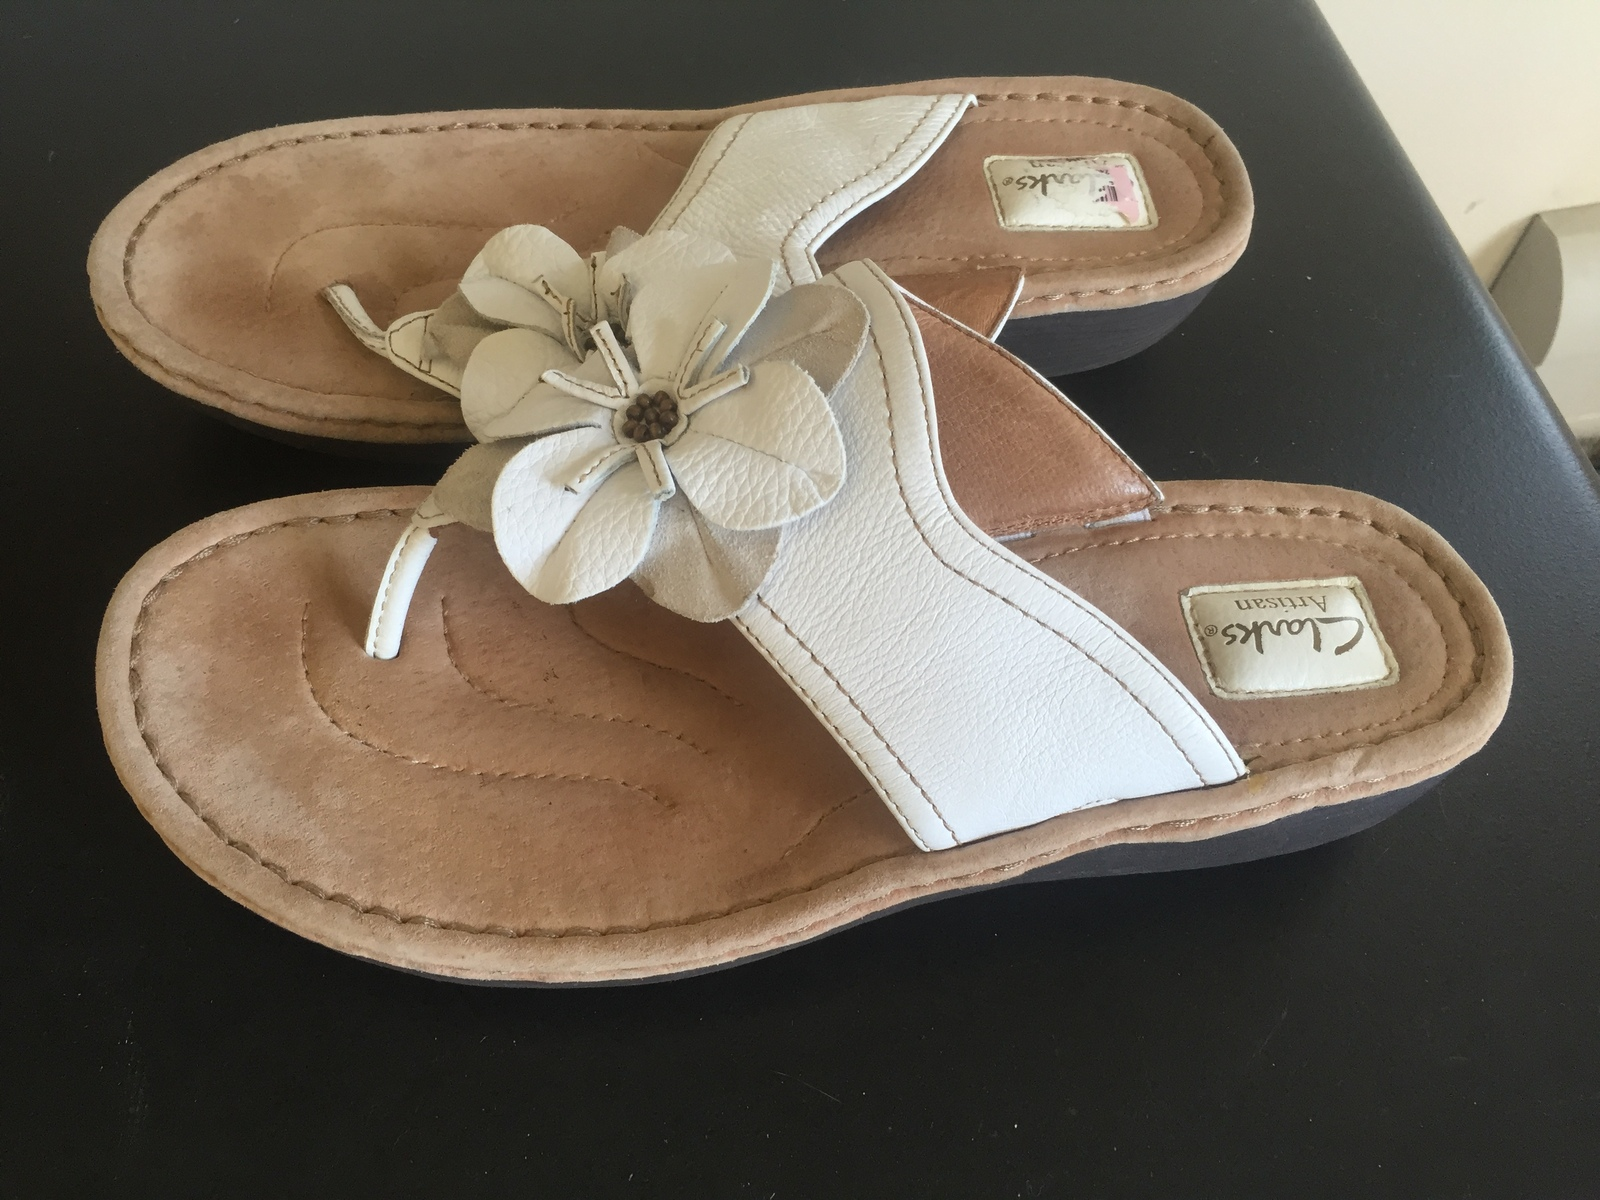 cfdb04b9f38 Clark s women s white leather thongs flip flops size 11 -  20.00